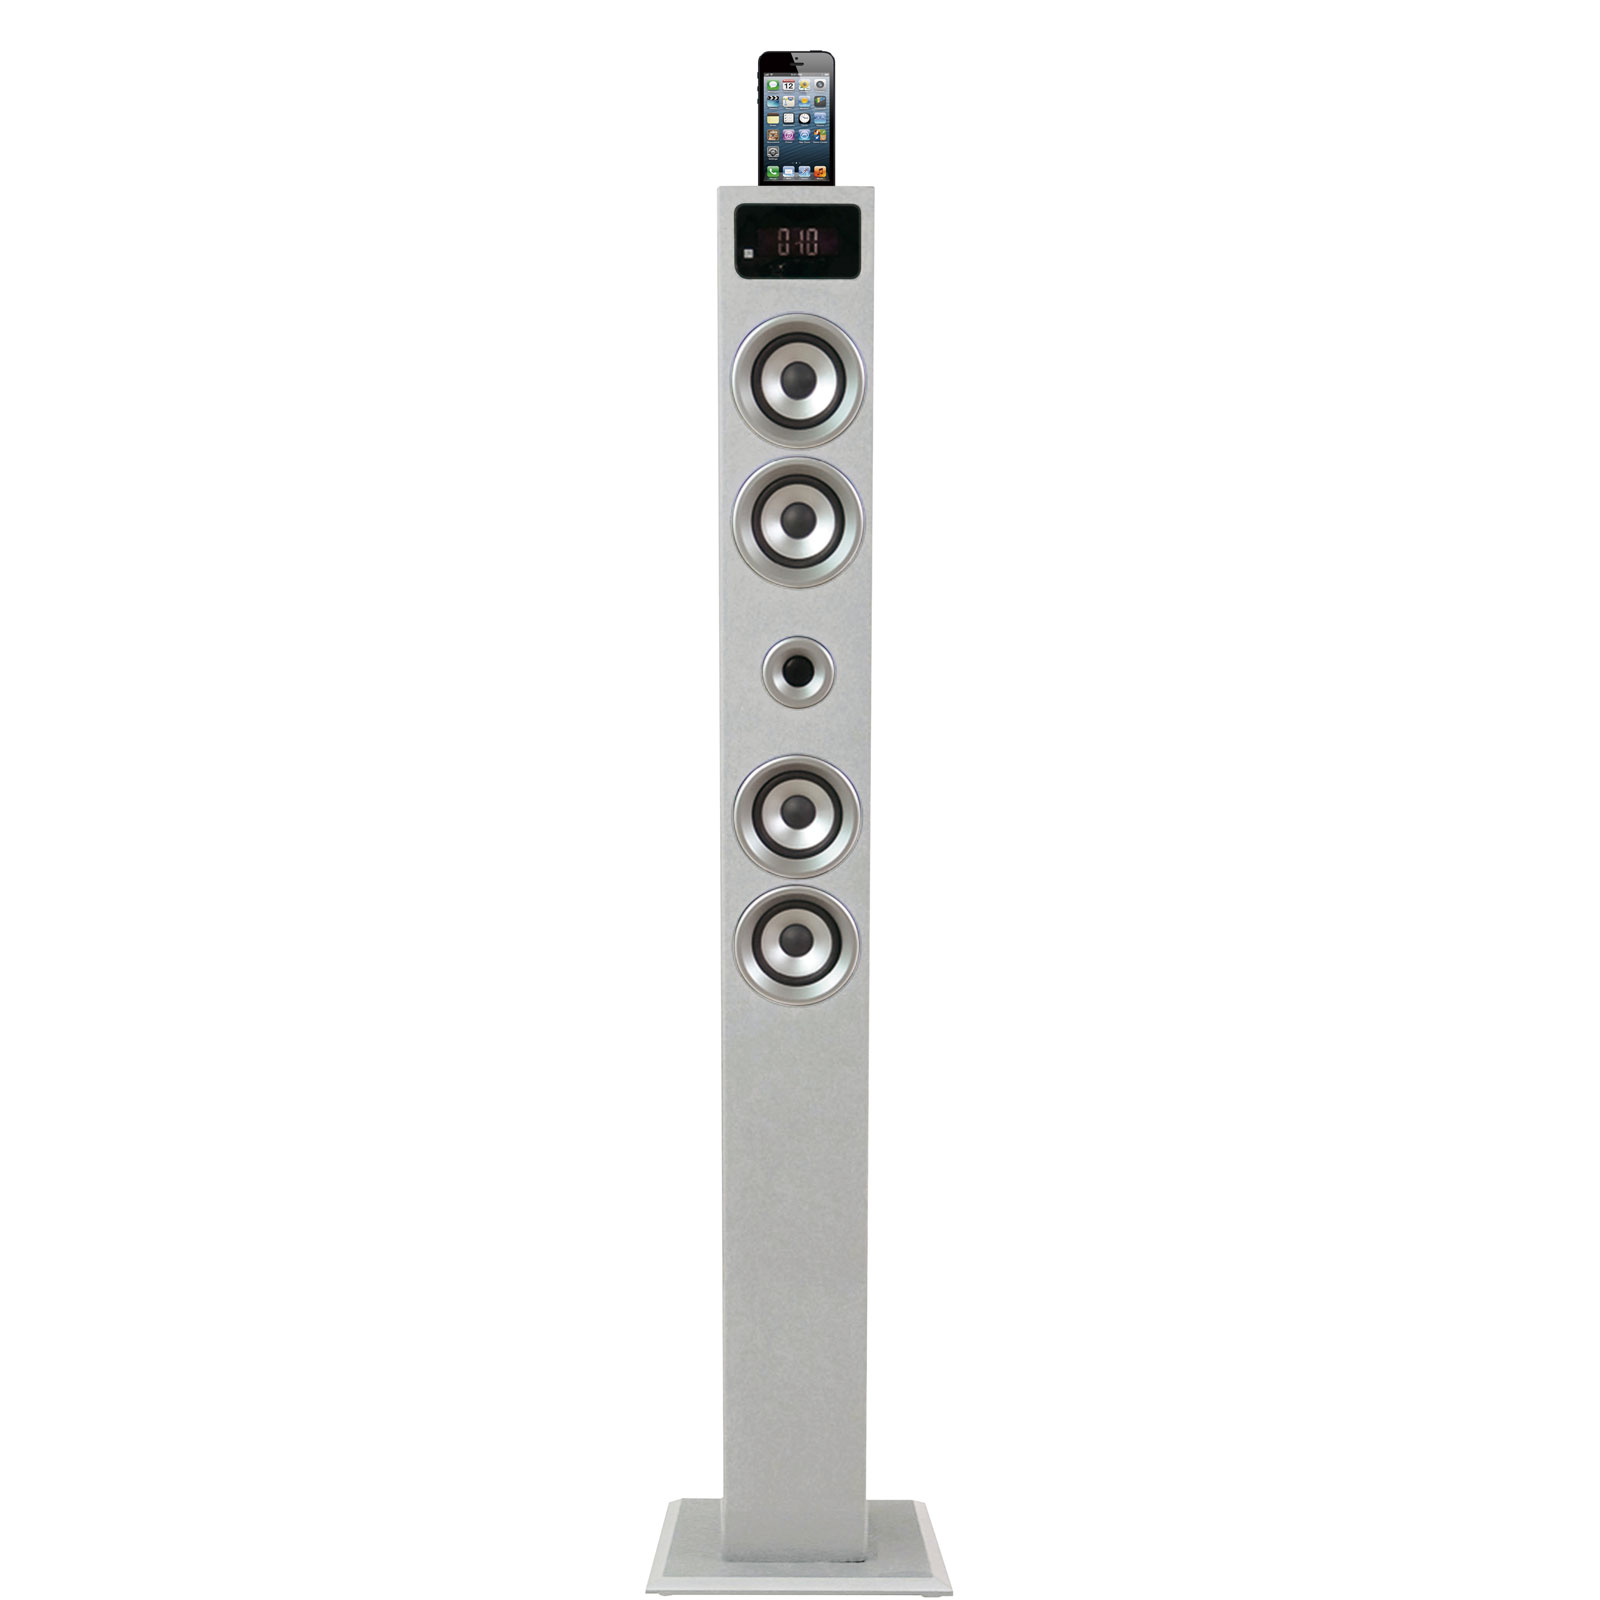 soundvision sv t03 bt blanc dock enceinte bluetooth soundvision sur ldlc. Black Bedroom Furniture Sets. Home Design Ideas